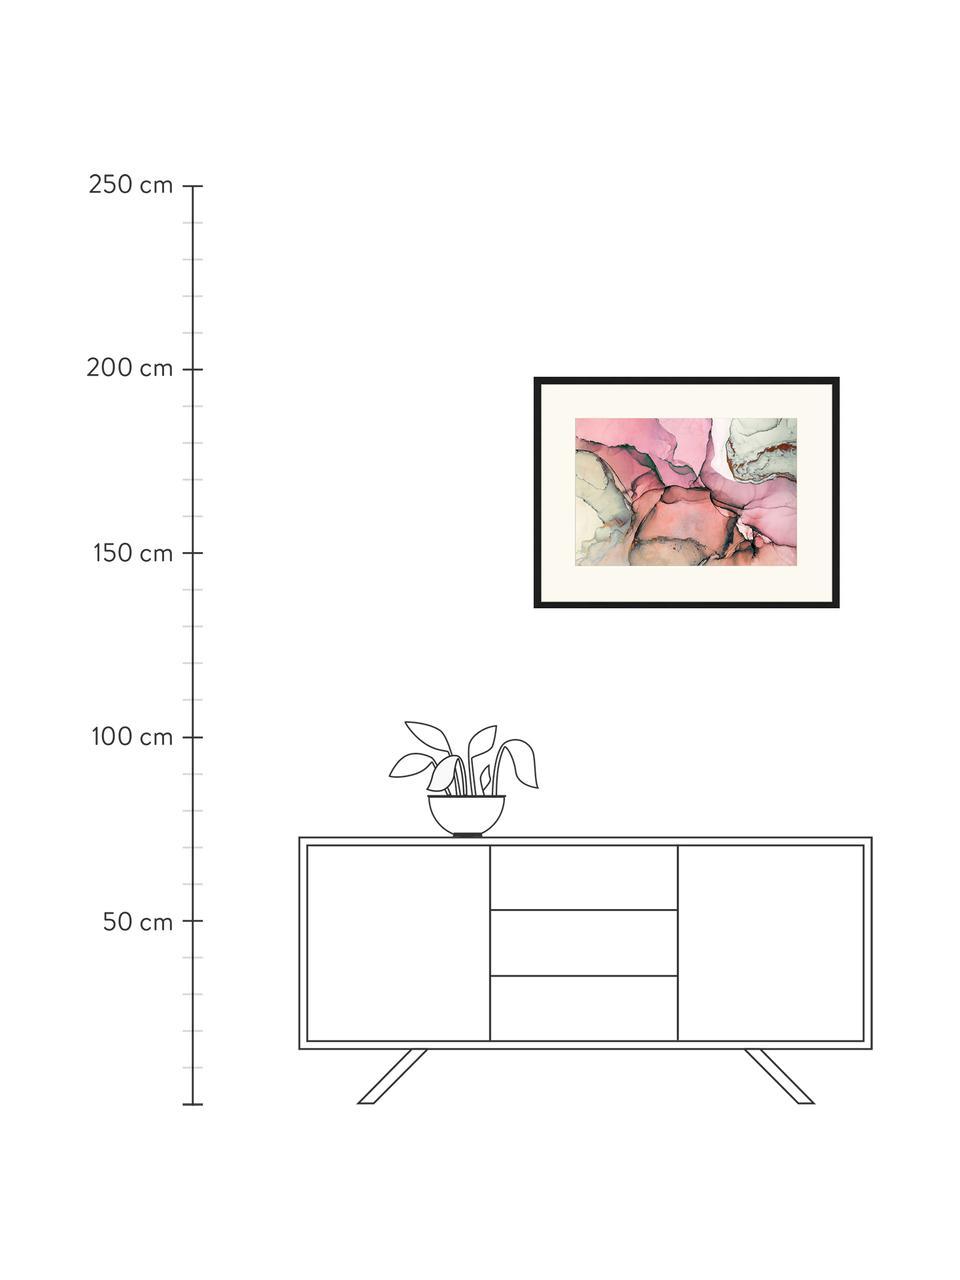 Gerahmter Digitaldruck Abstract Art I, Bild: Digitaldruck auf Papier, , Rahmen: Holz, lackiert, Front: Plexiglas, Mehrfarbig, 83 x 63 cm